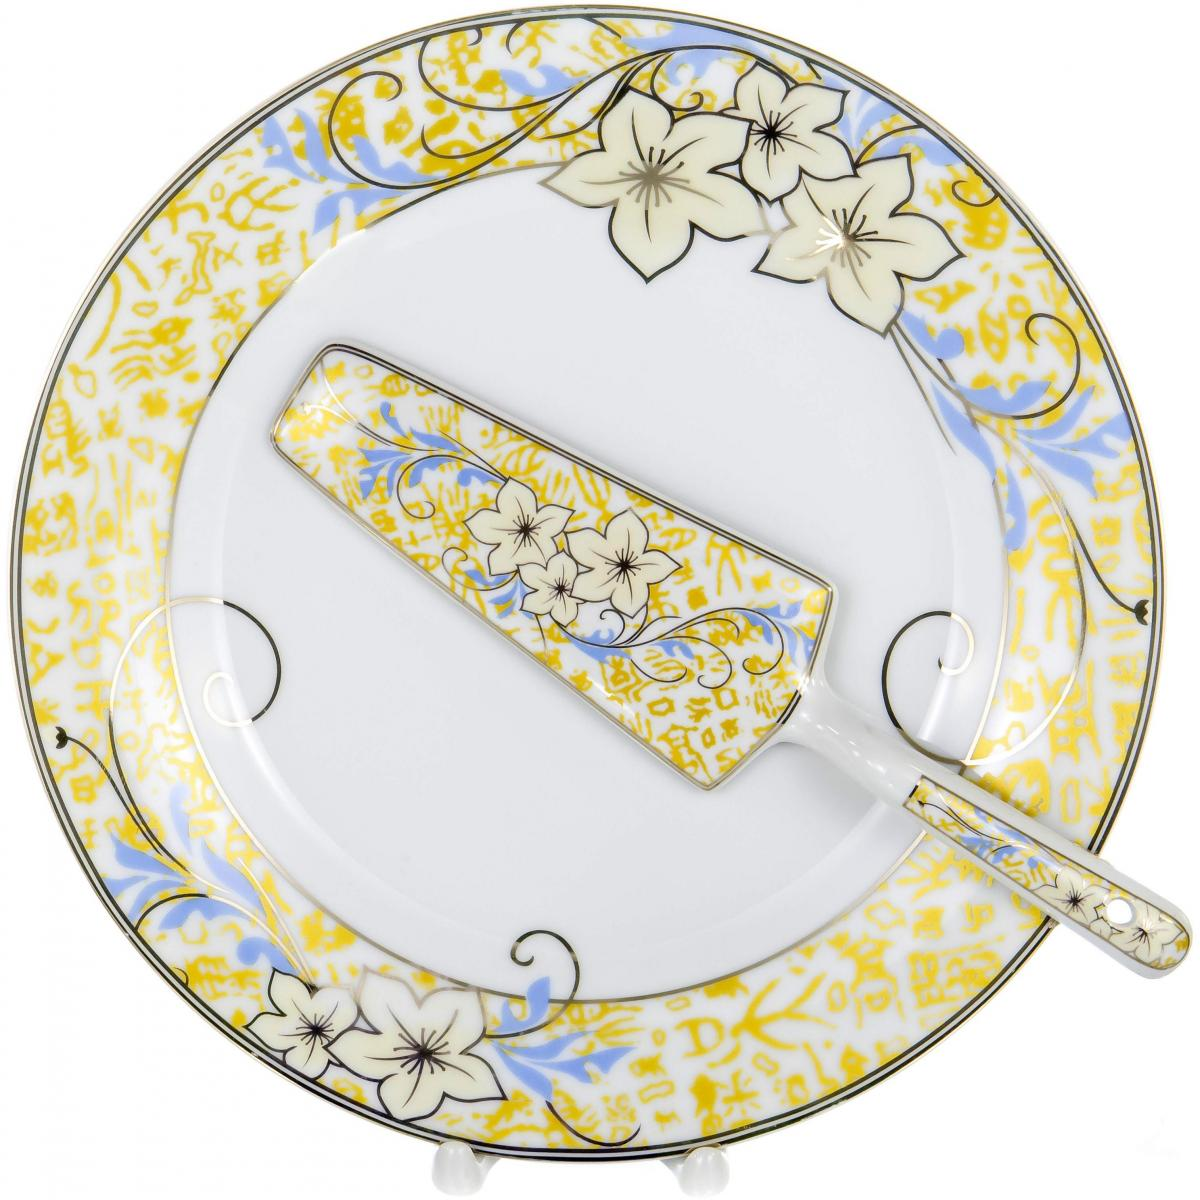 Набор для торта Olaff, 2 предмета. LRG-CPN2-006LRG-CPN2-006CAKE 2, набор д/торта (2) блюдо 255мм + лопатка, декор - золото-серебро, подарочная упаковка